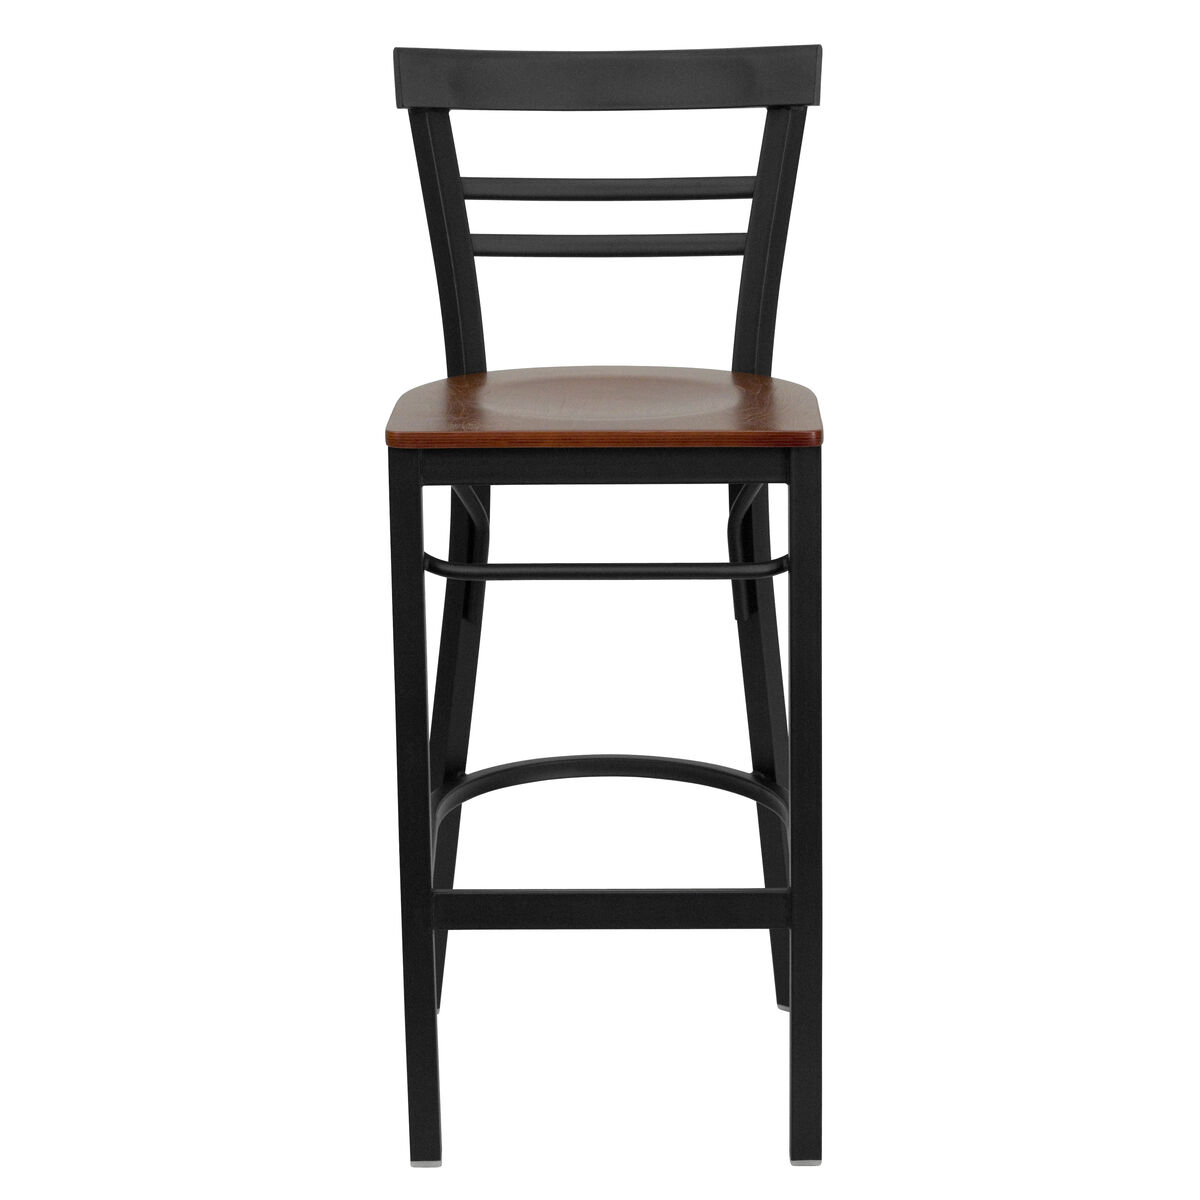 Black Ladder Stool Cherry Seat Bfdh 6145cwbarlad Tdr